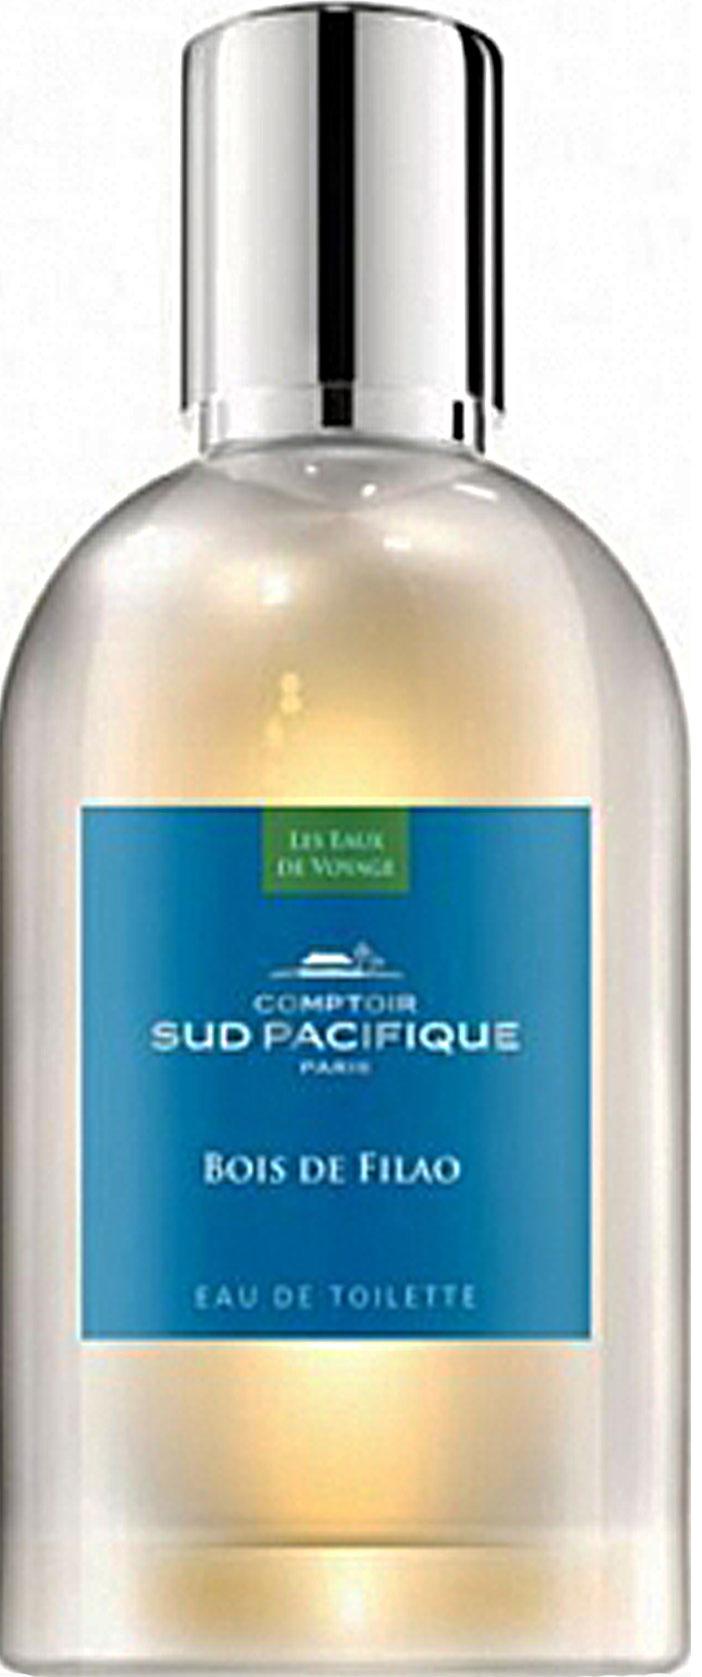 Comptoir Sud Pacifique Bois De Filao туалетная вода 100мл (Сюд Пасифик Бойс Де Филао)